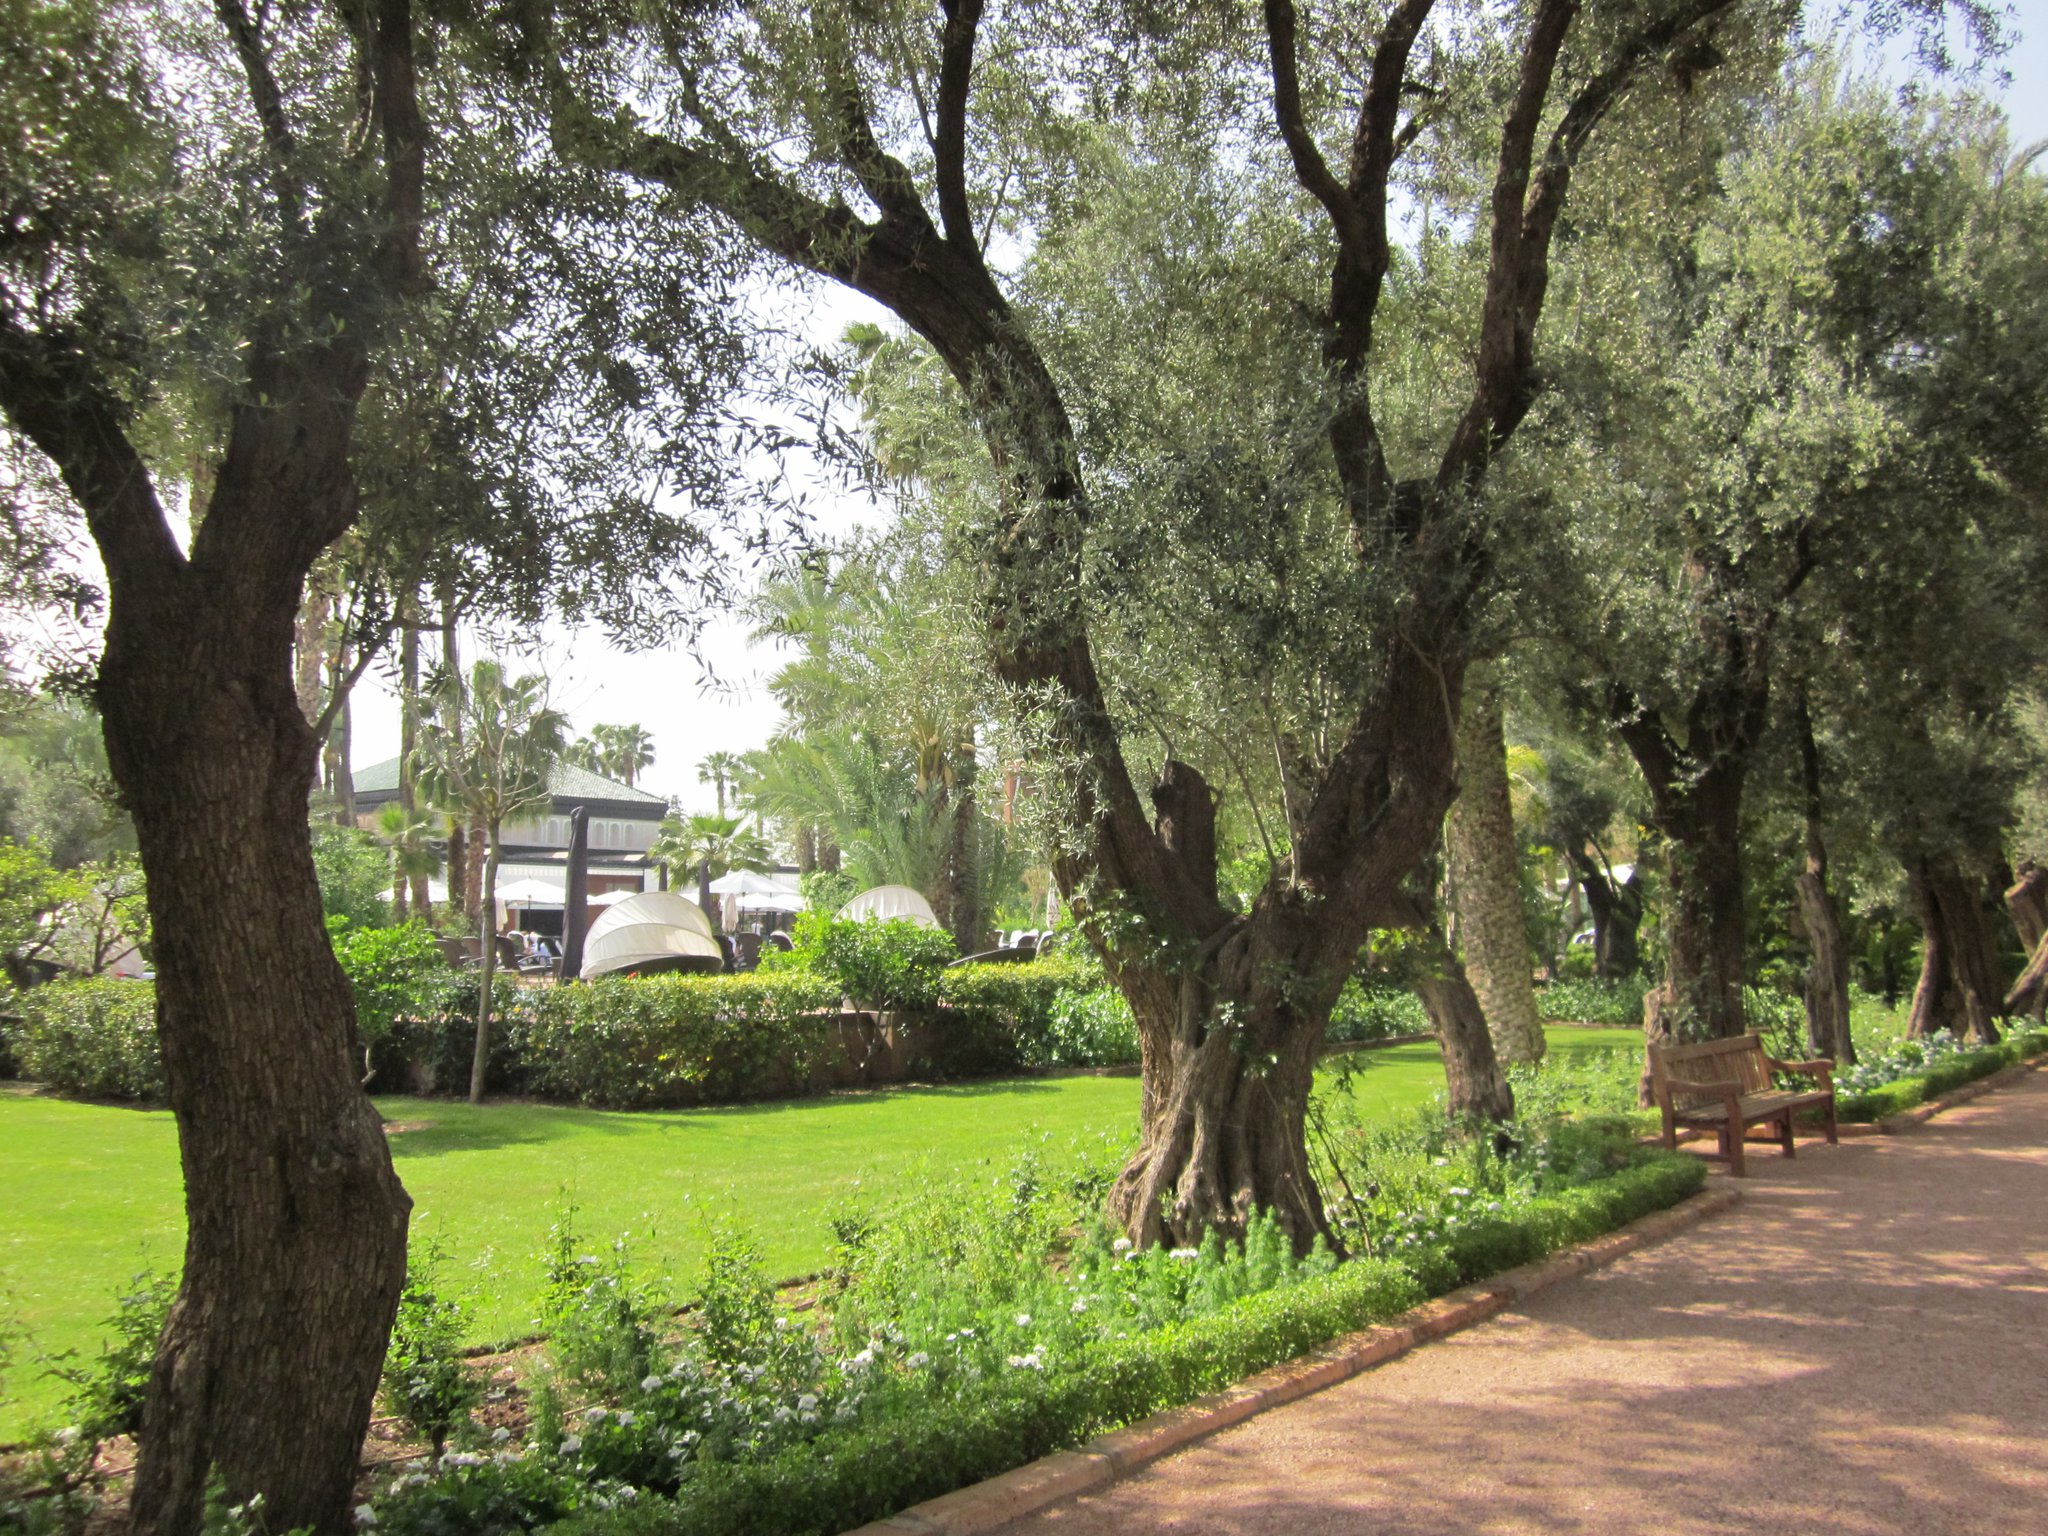 Marrakesh Garten